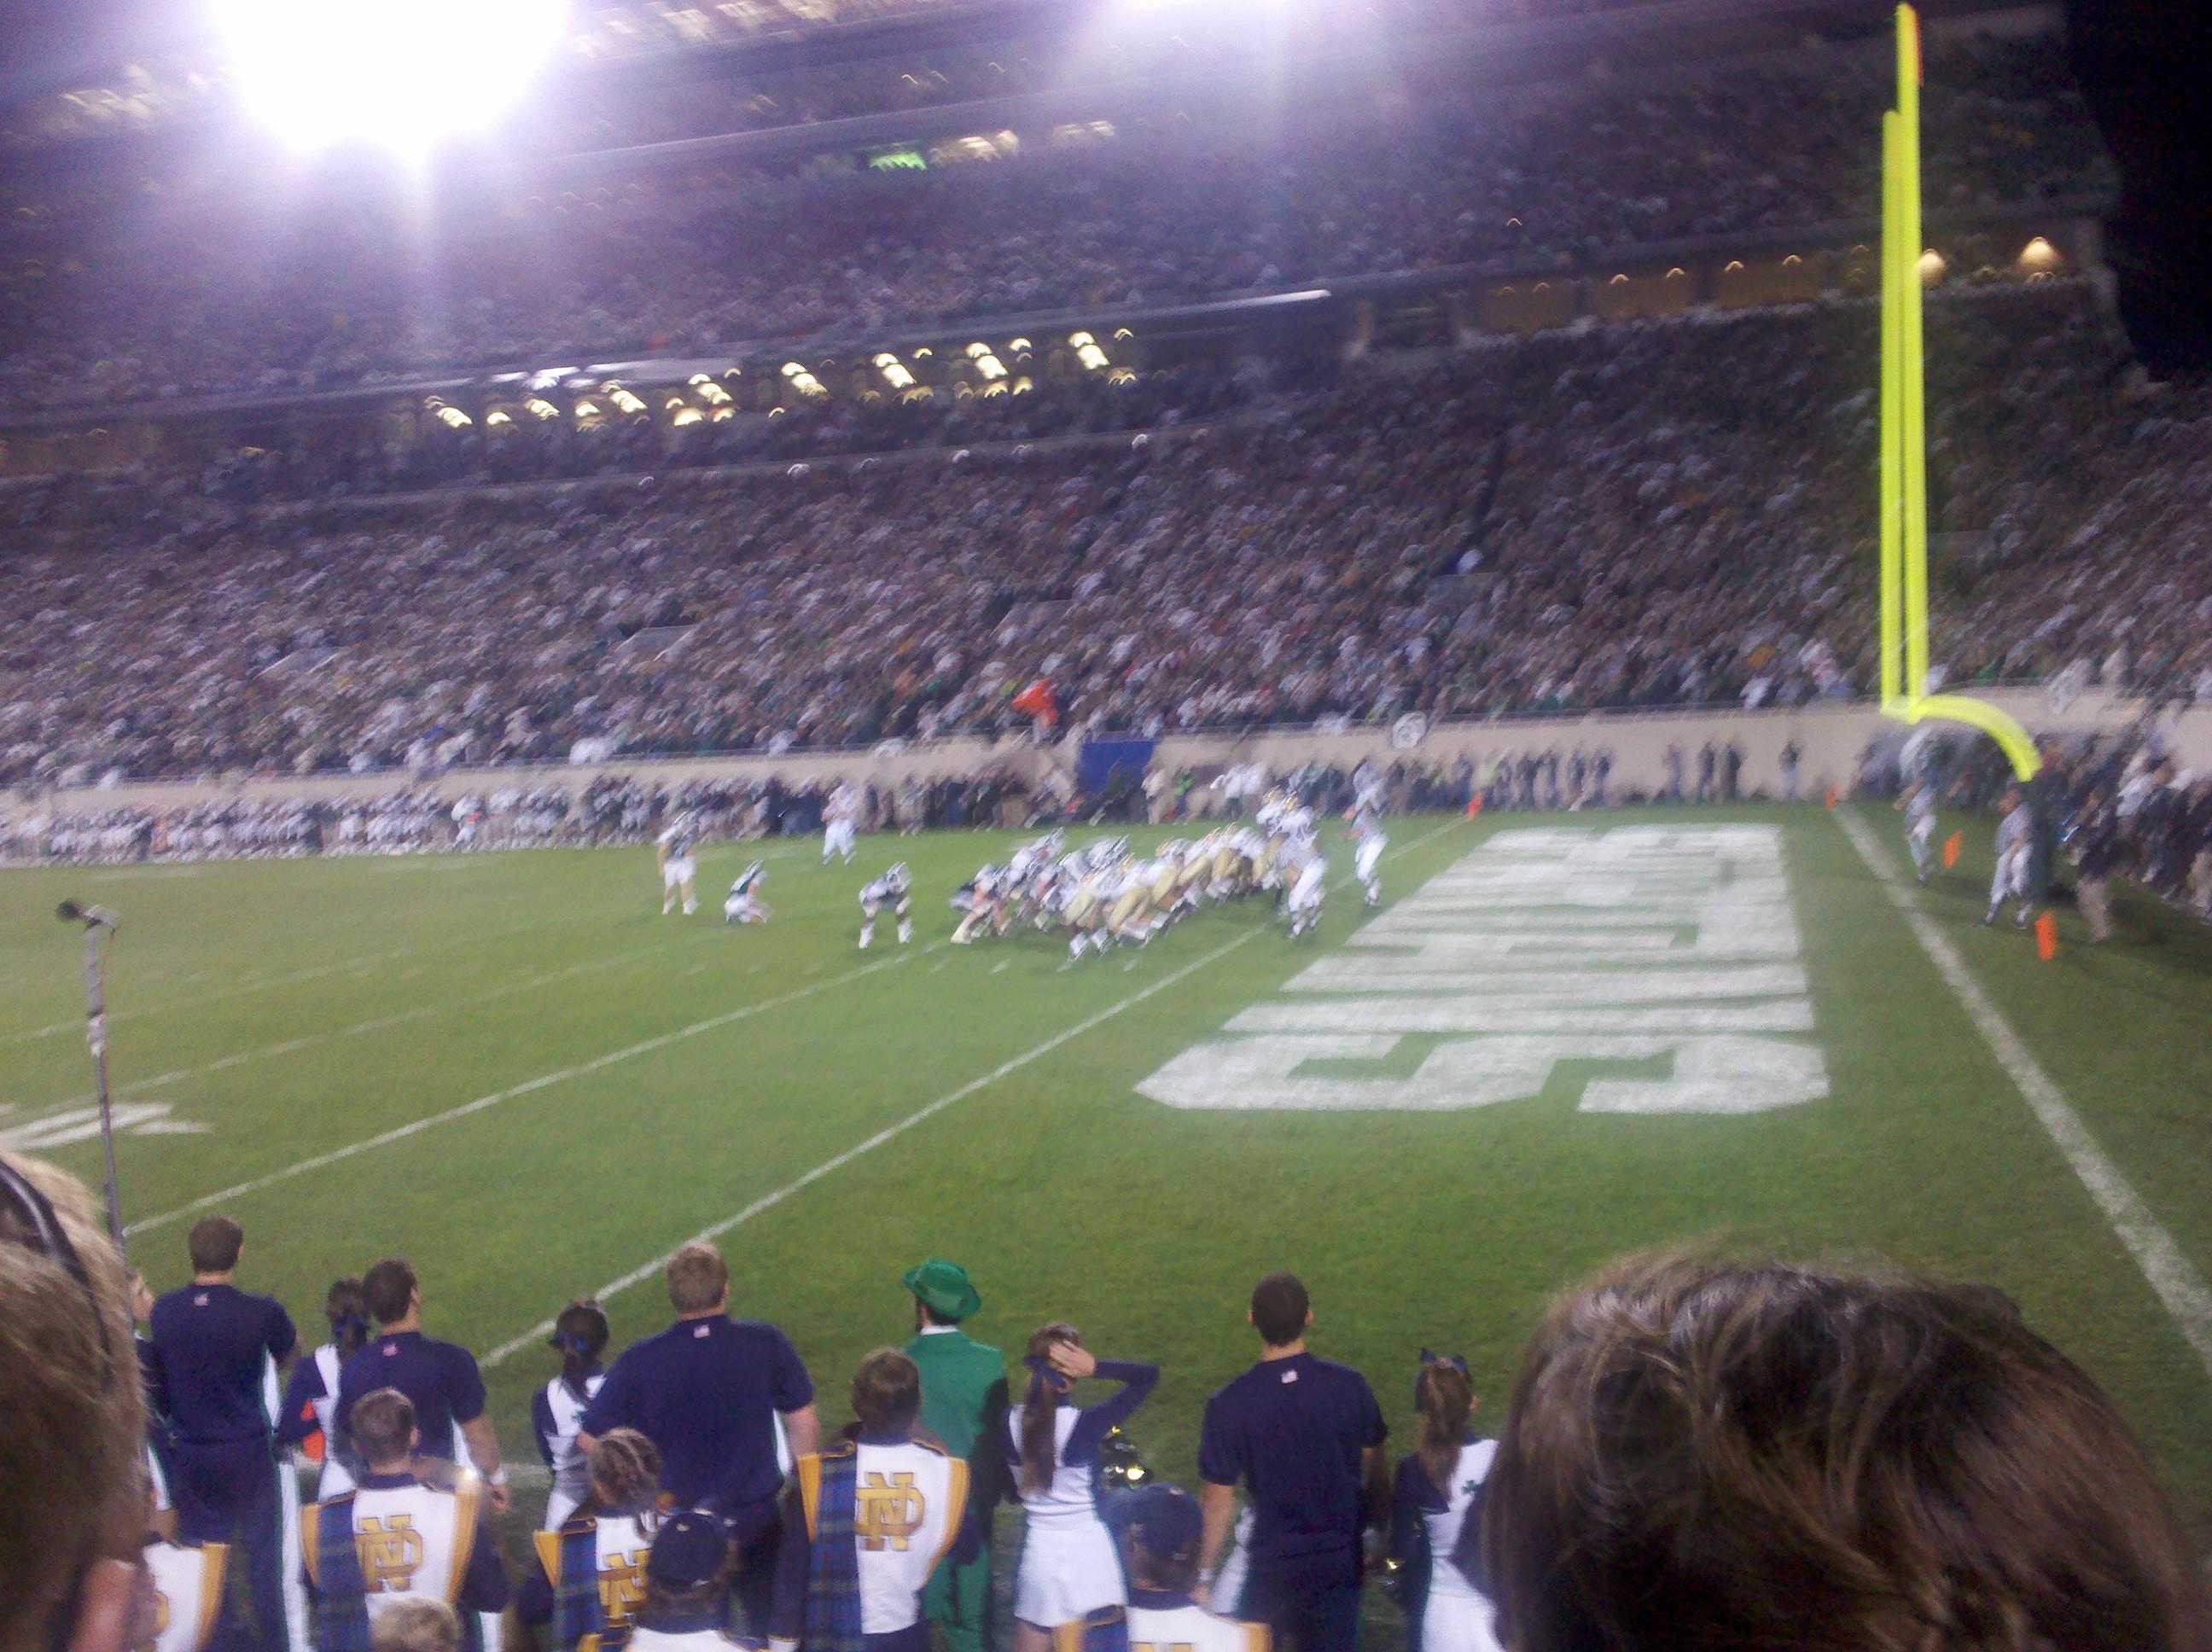 Spartan Stadium Section 5 Row 2 Seat 5